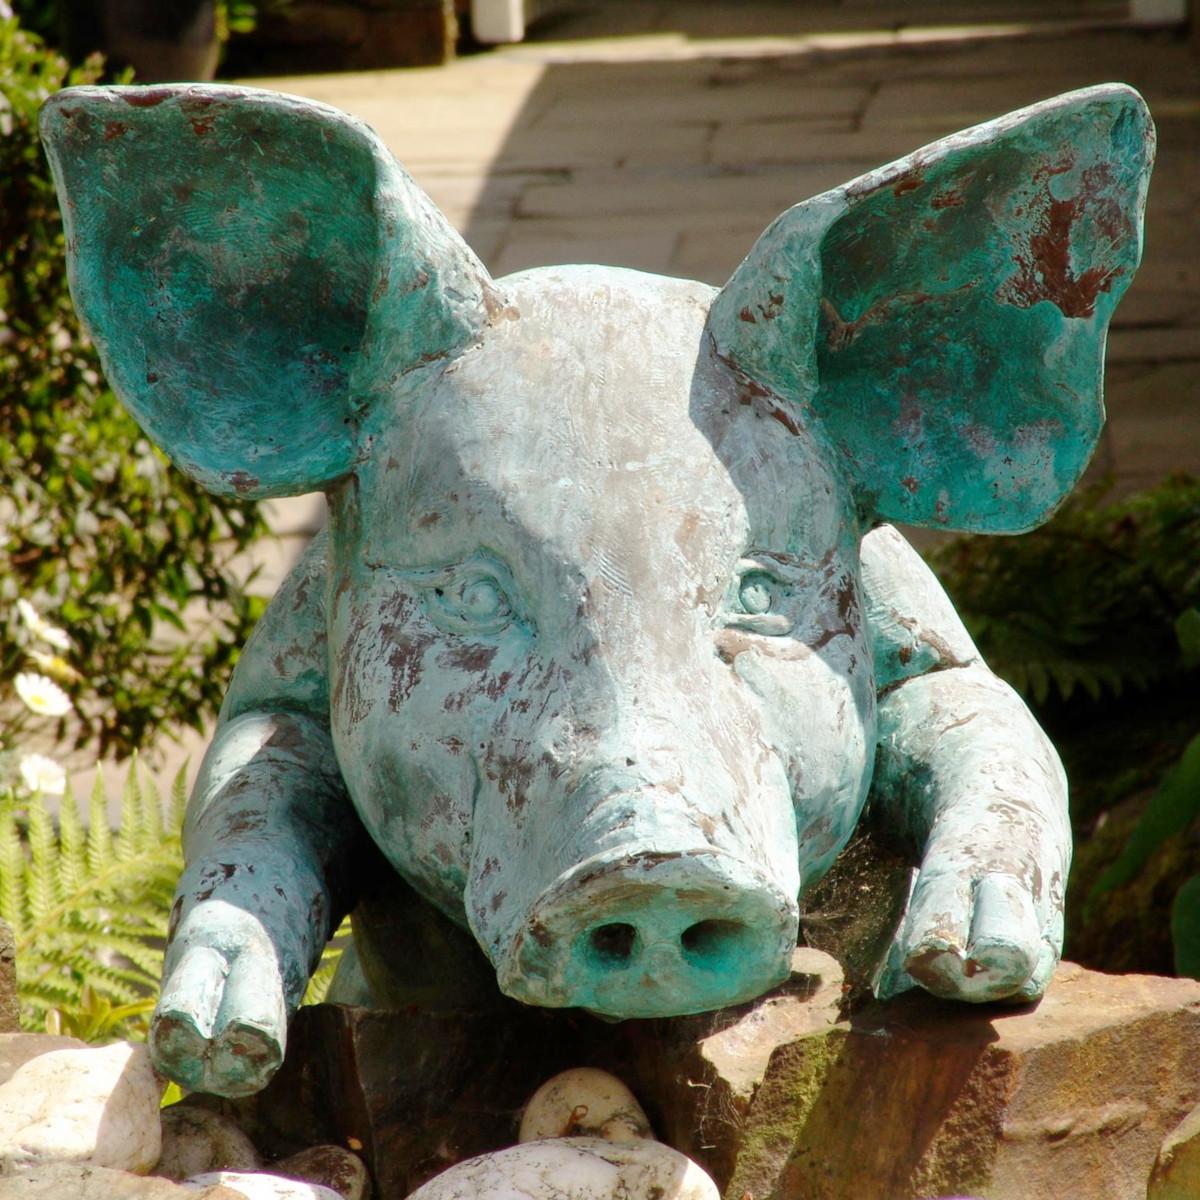 Hubert the pig